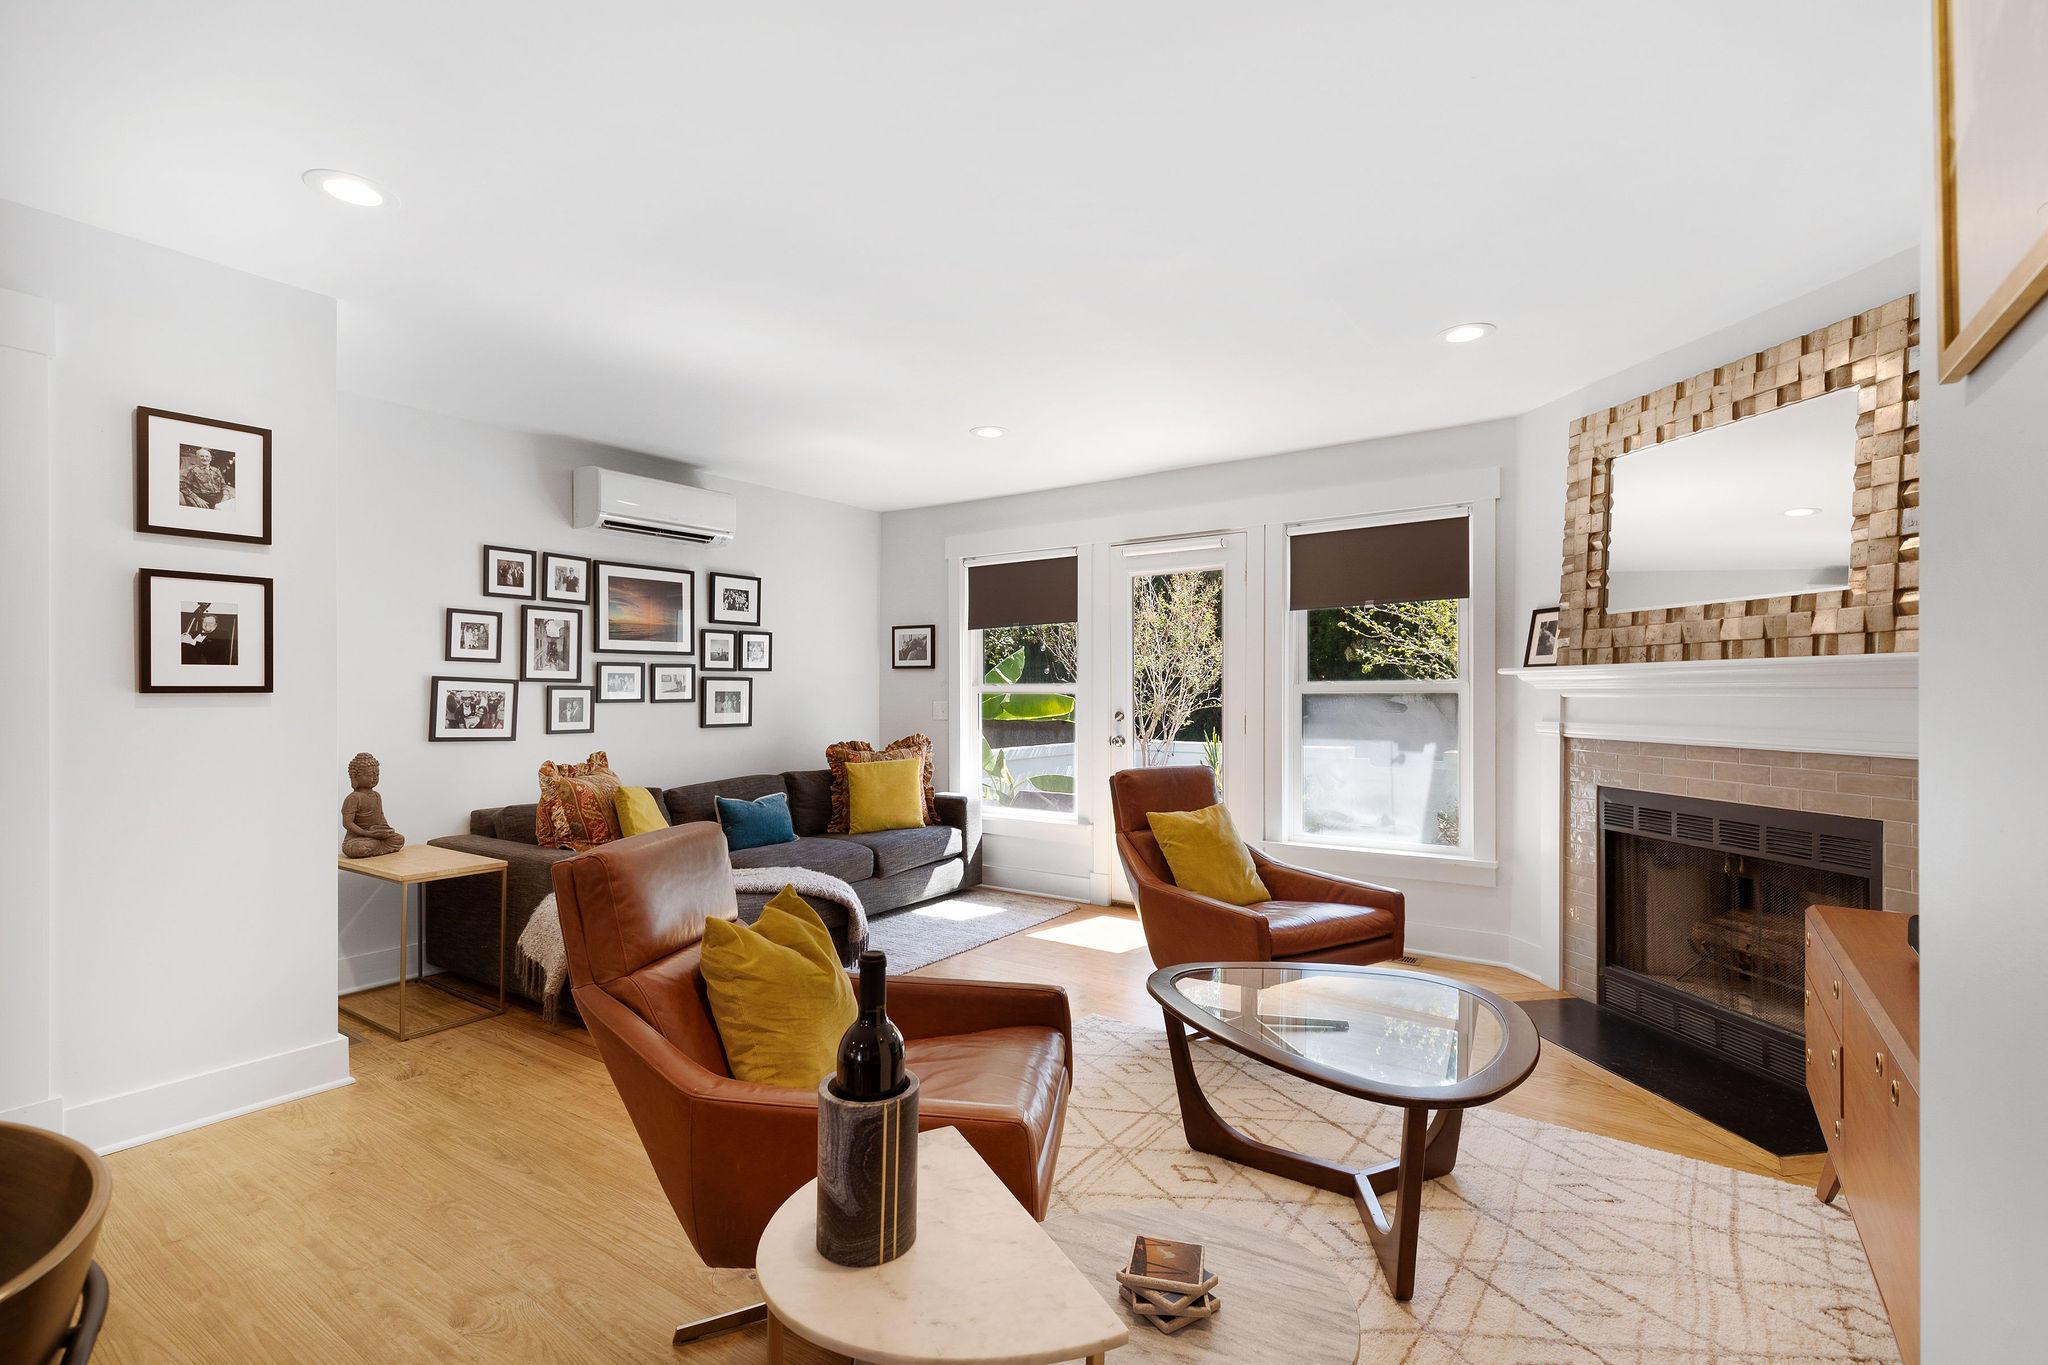 Proprietors Row Homes For Sale - 824 Colony, Charleston, SC - 8